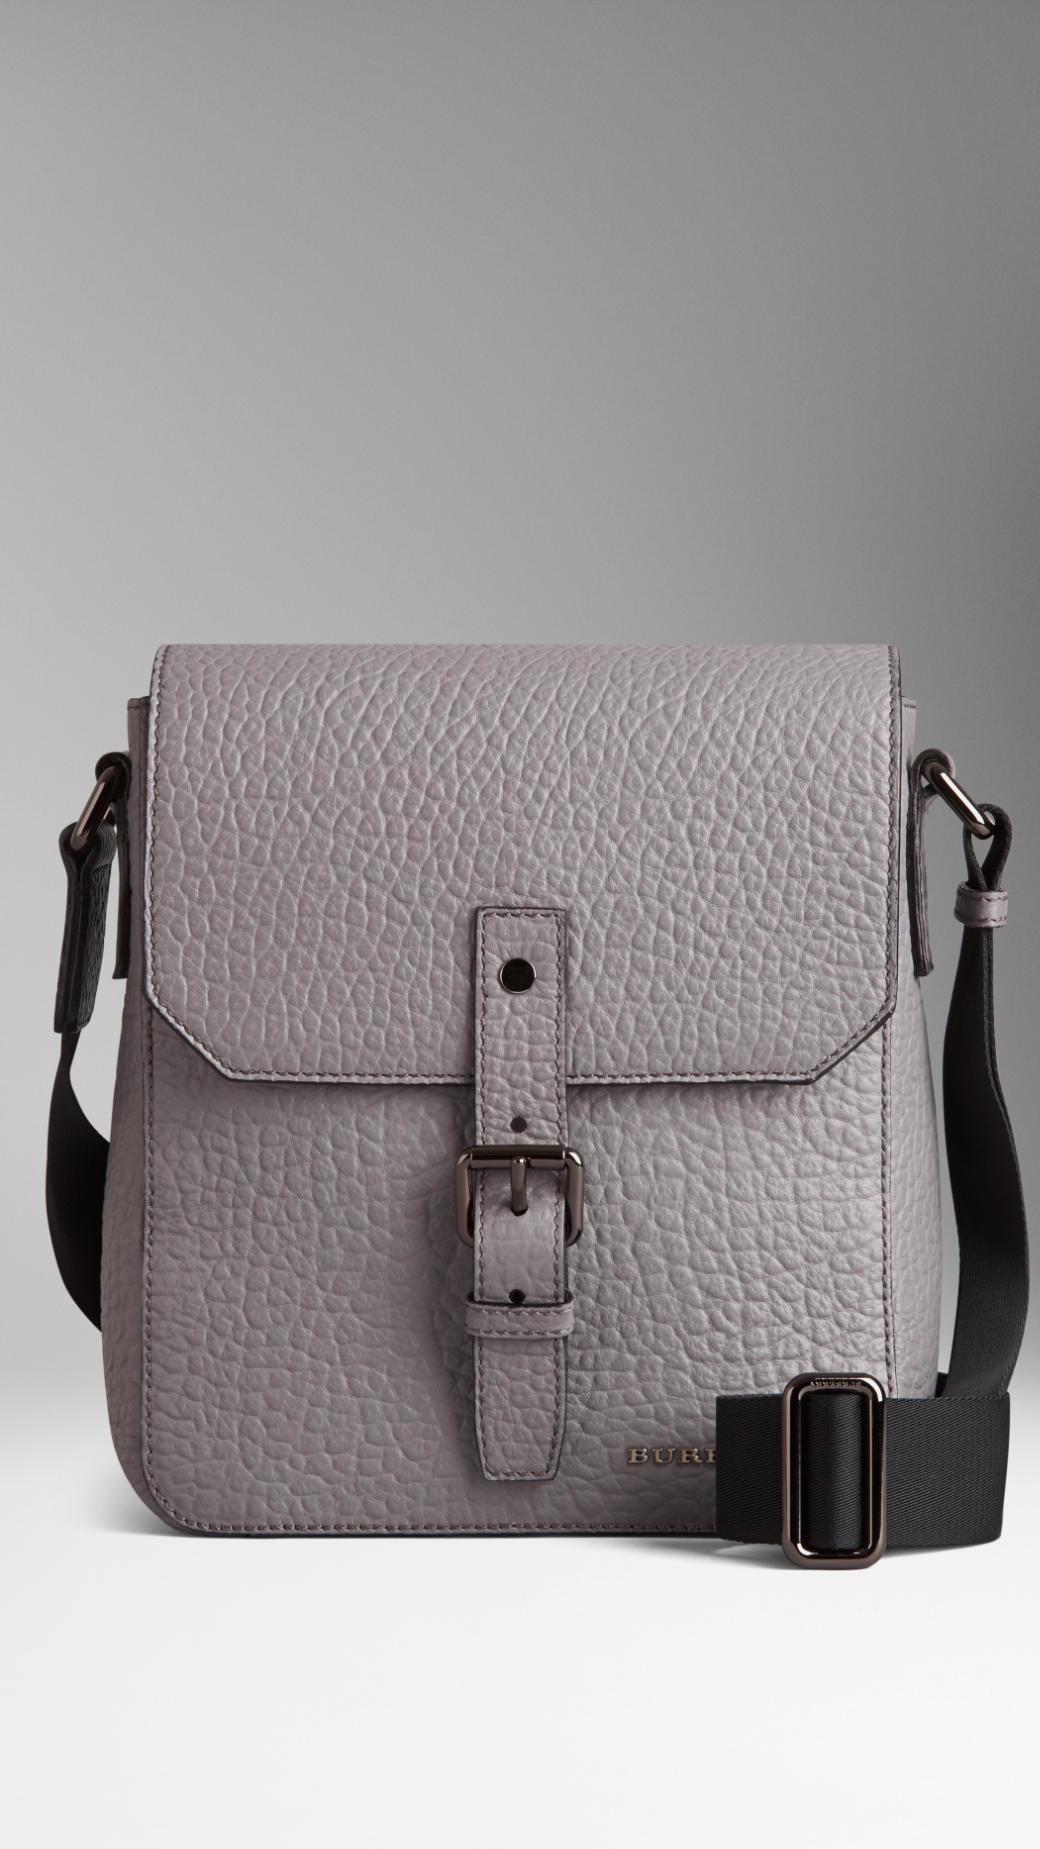 Lyst - Burberry Matte Signature Grain Leather Crossbody Bag in Gray for Men